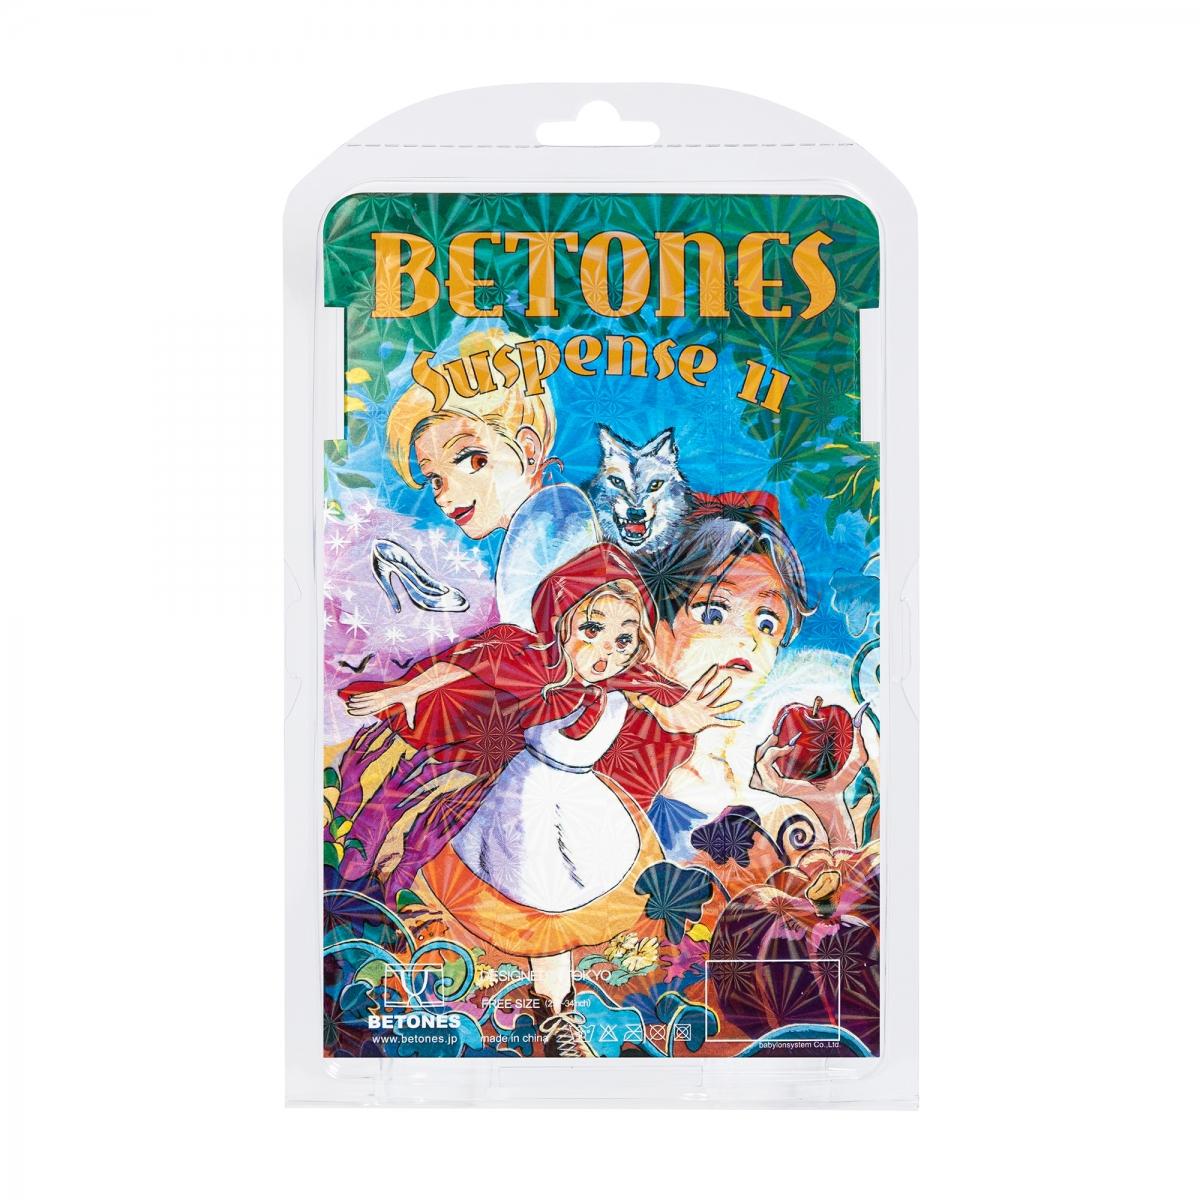 BETONES ボクサーパンツ SUSPENCE11 PINK